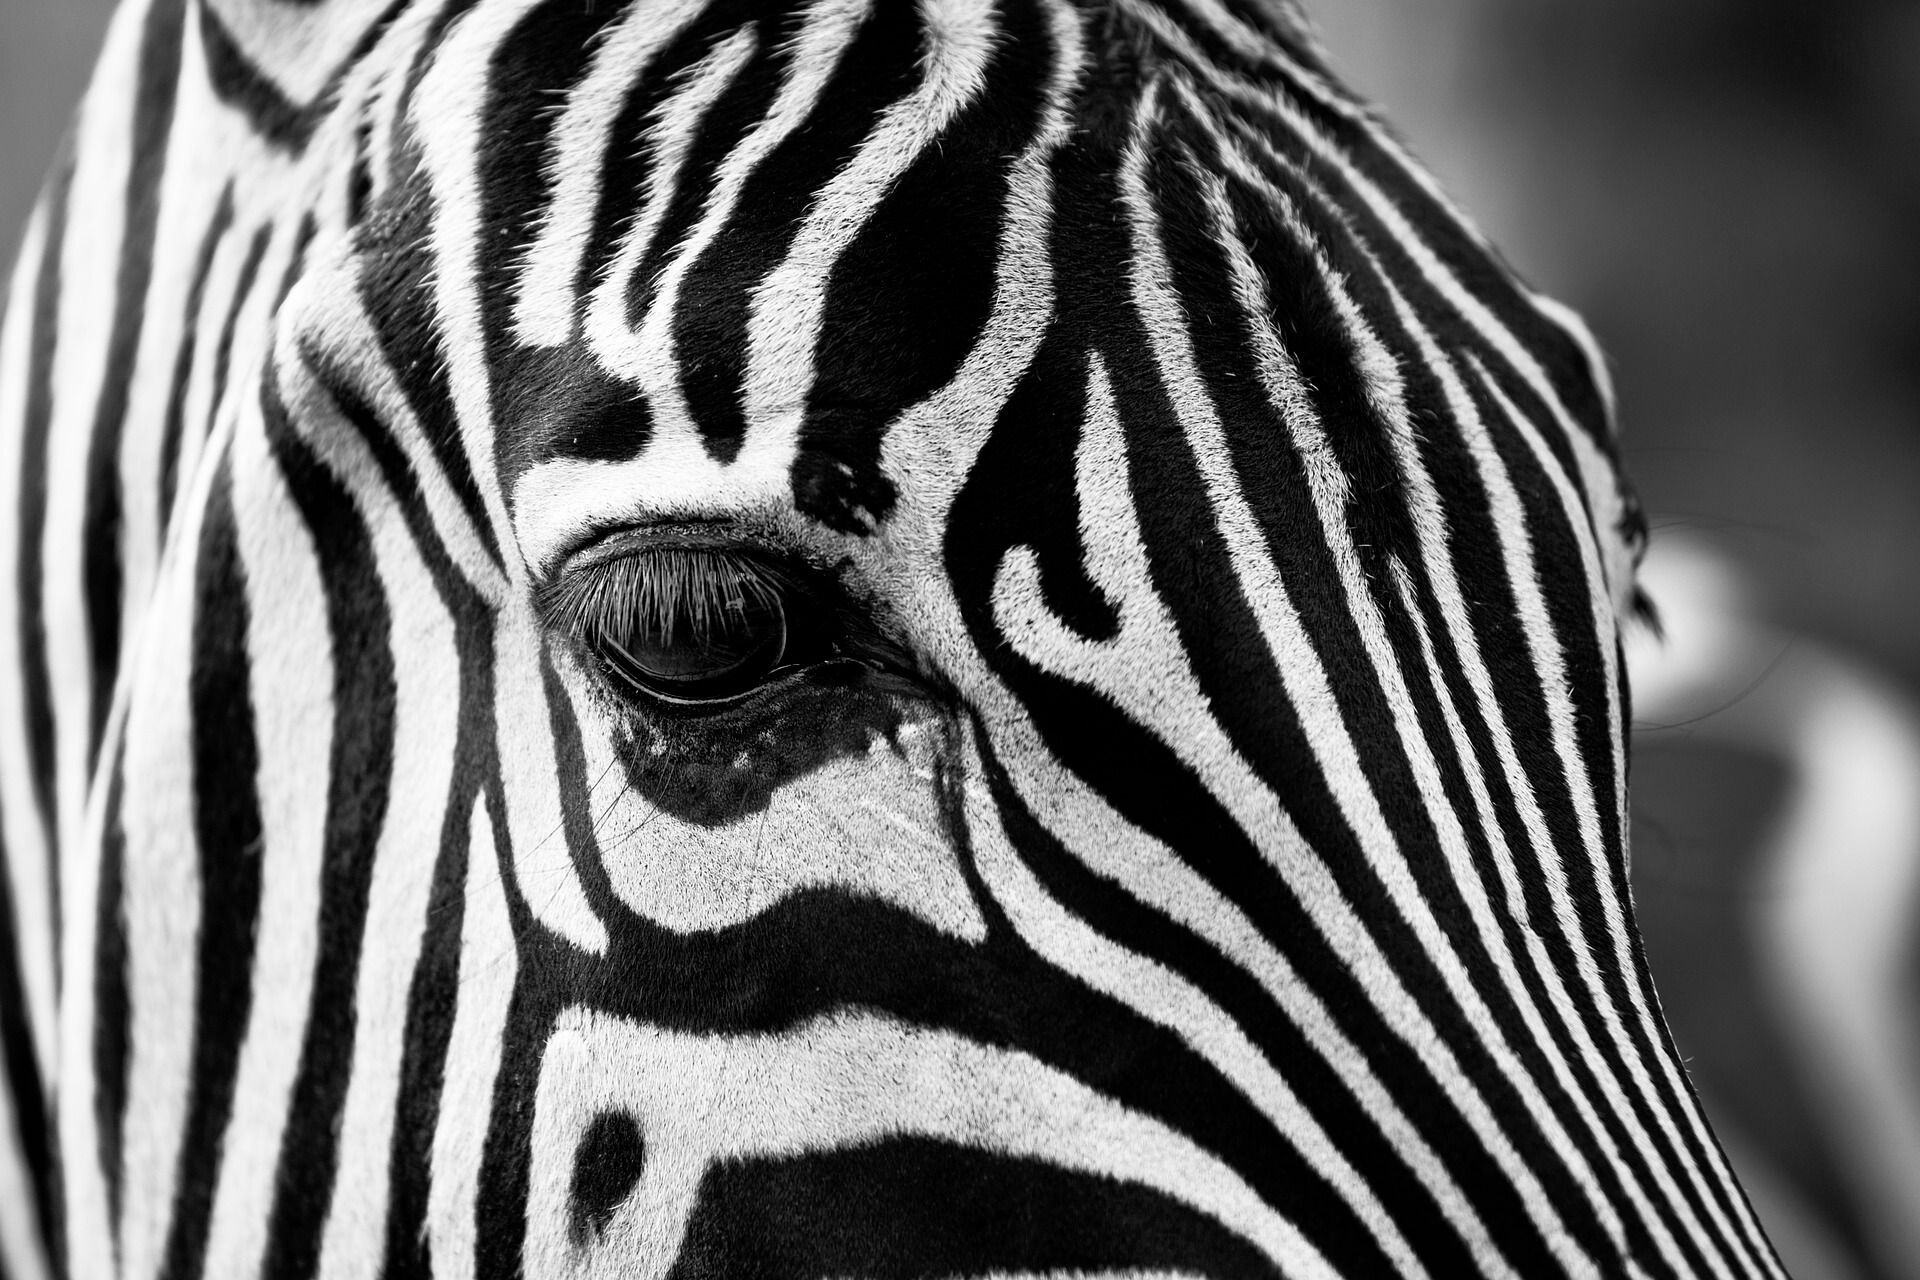 Zebra face CC0